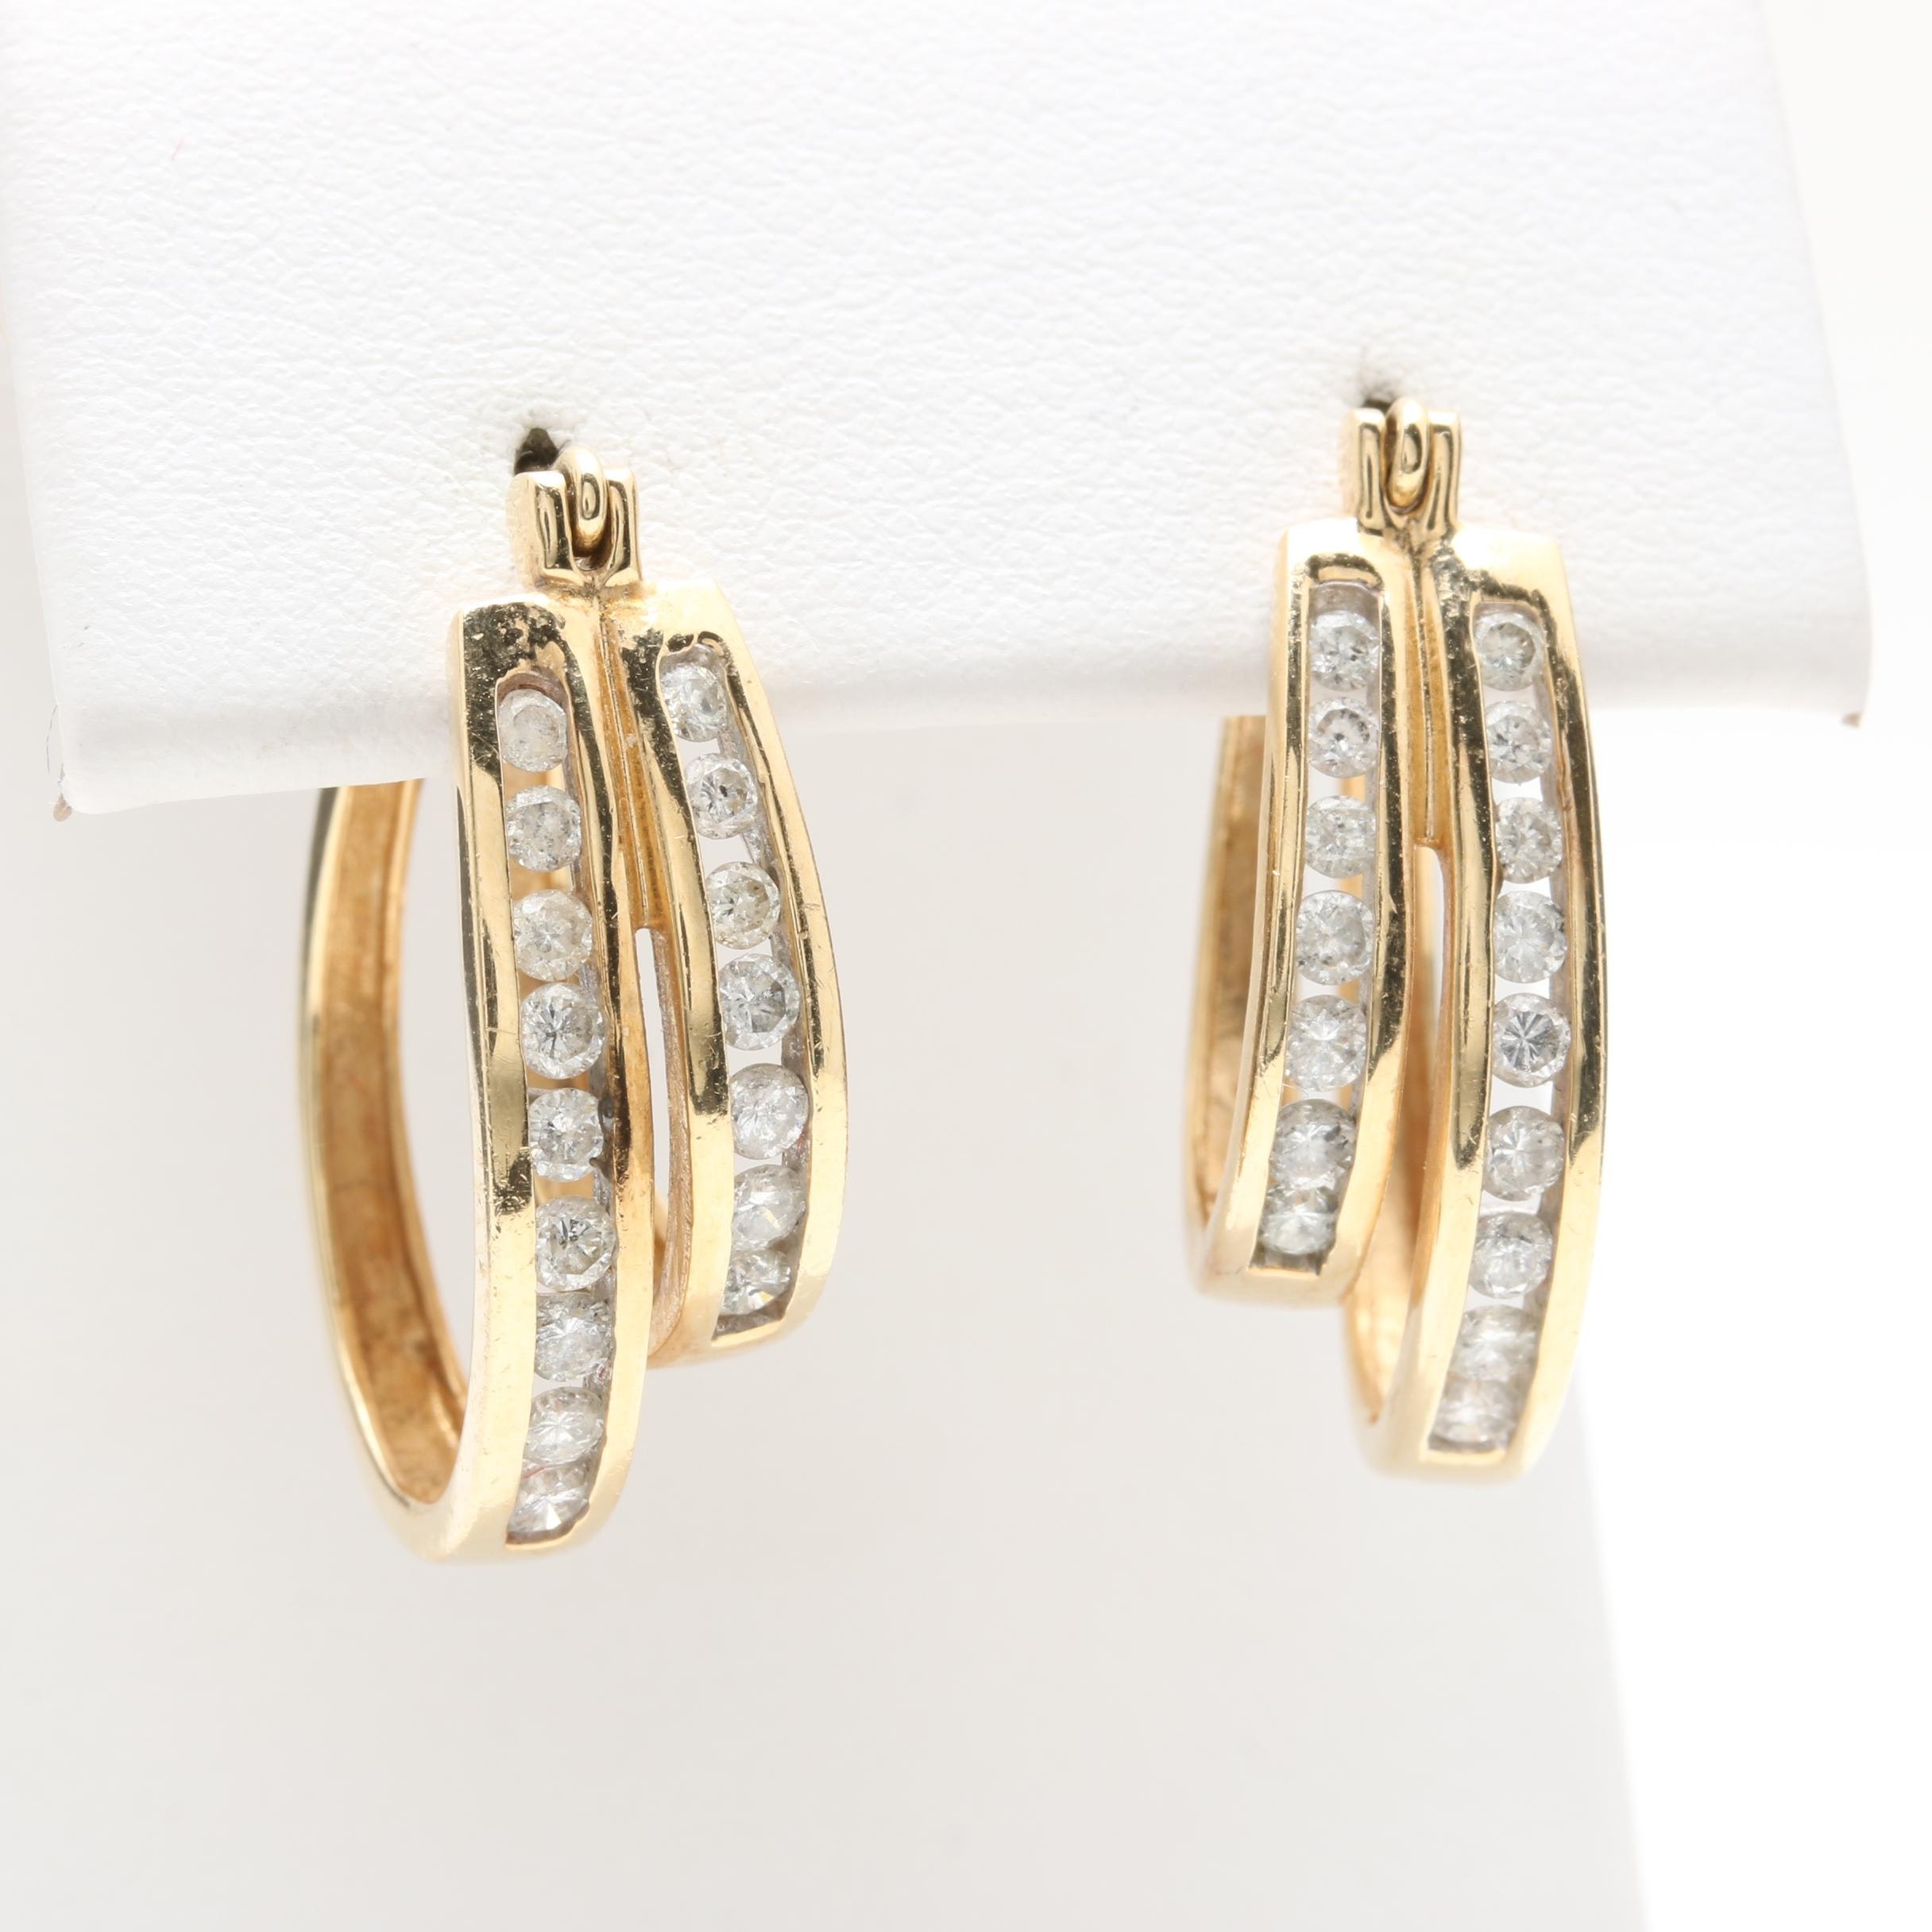 14K Yellow Gold Diamond Double Hoop Earrings